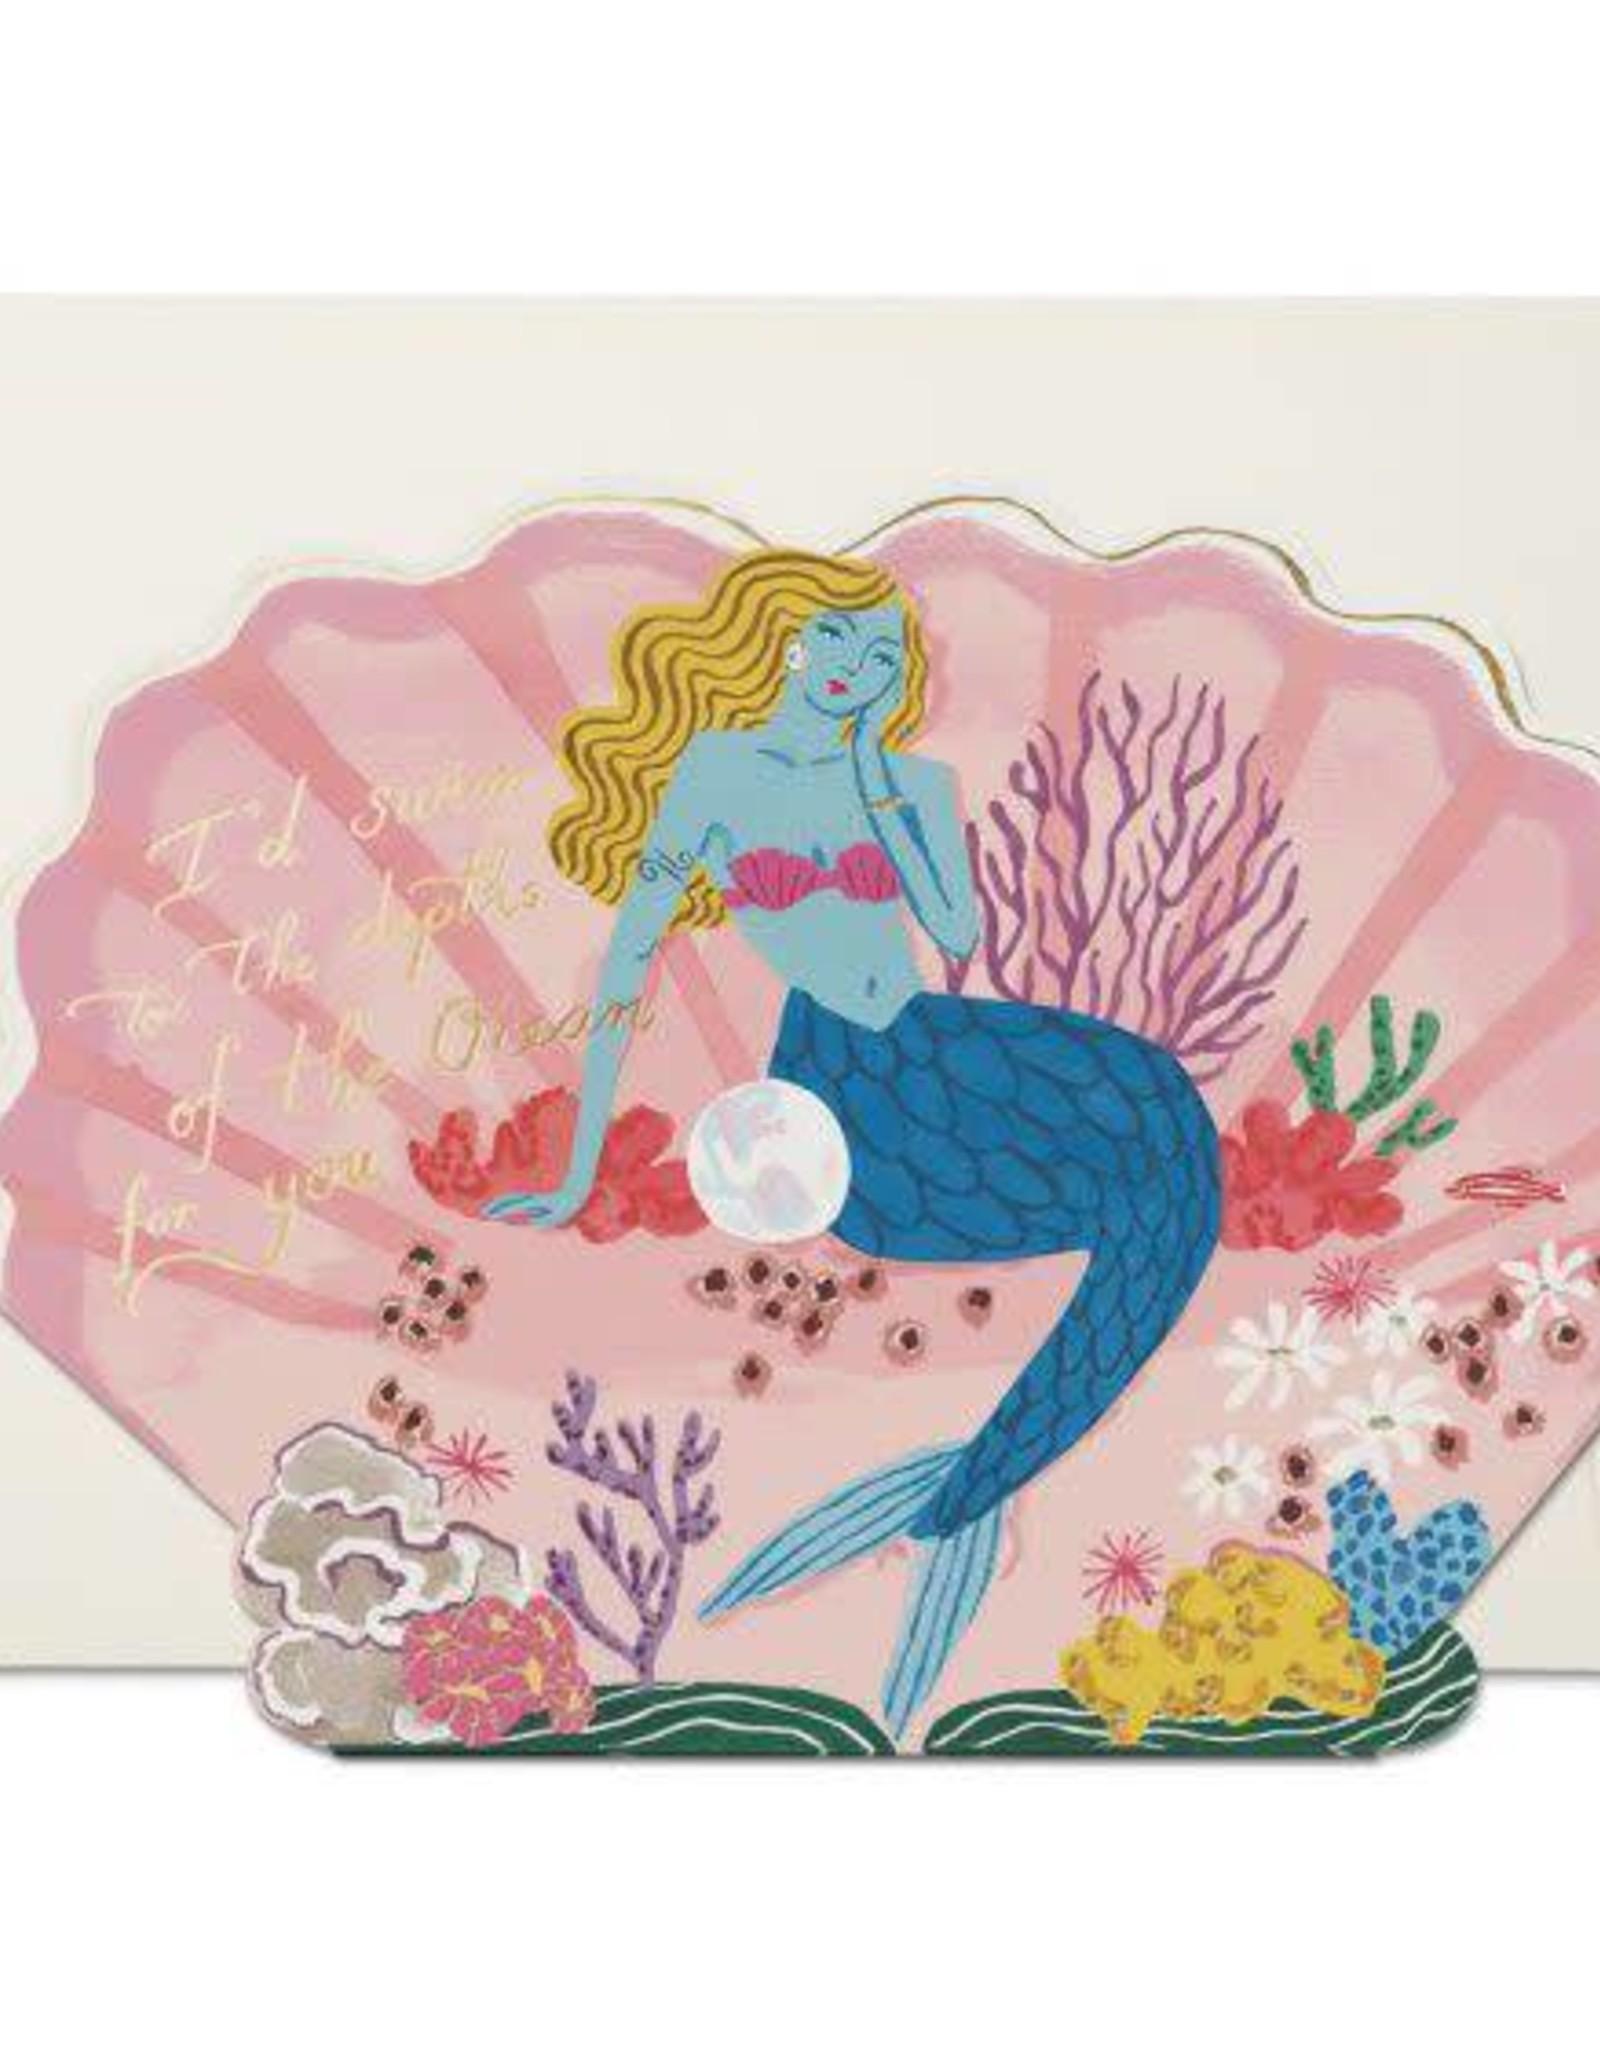 Depths of the Ocean For You Mermaid Greeting Card